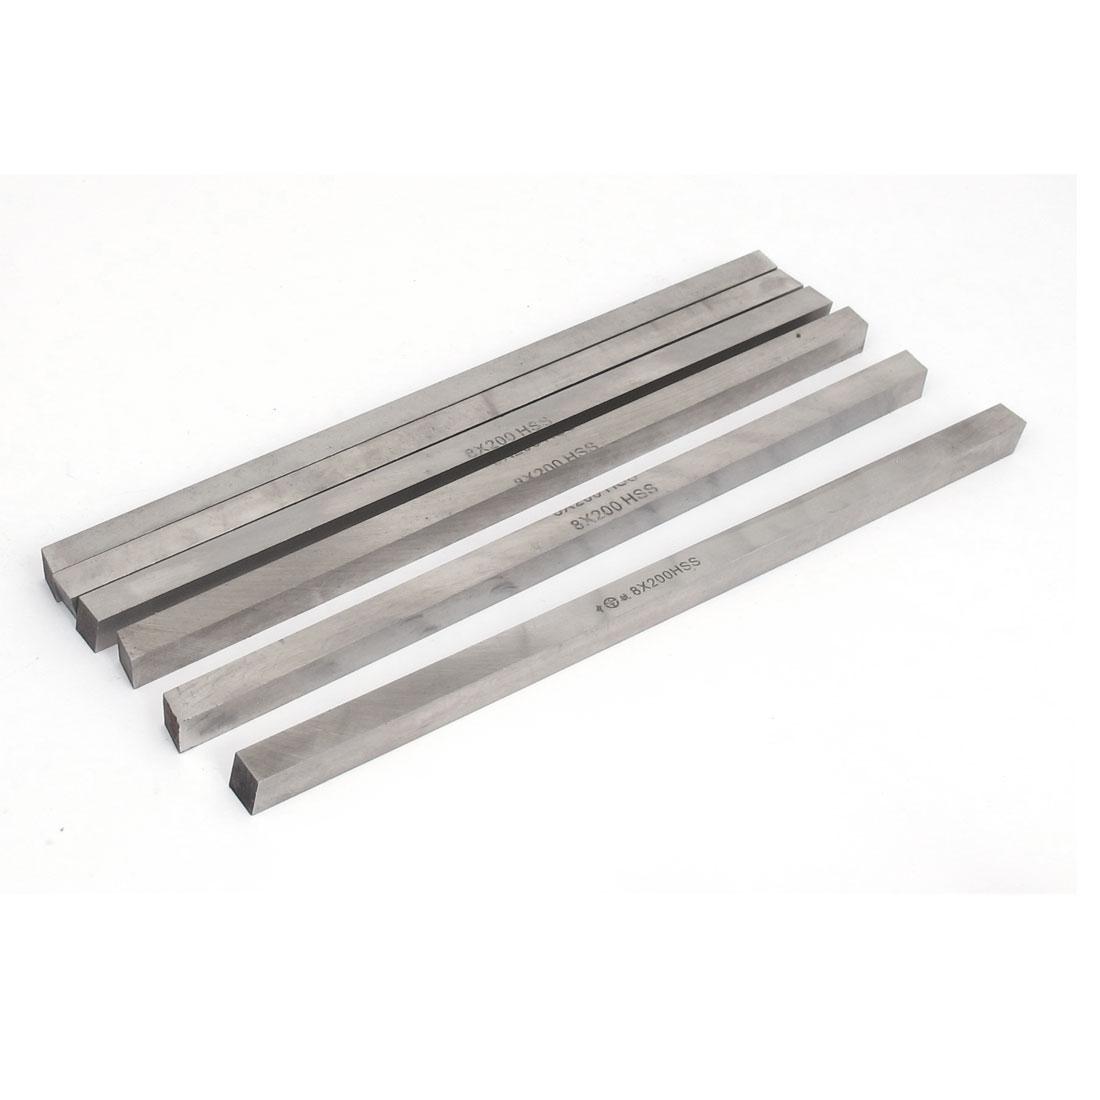 High Speed Steel CNC Lathe HSS Square Cutting Tool Bits Bar 8x8x200mm 6pcs